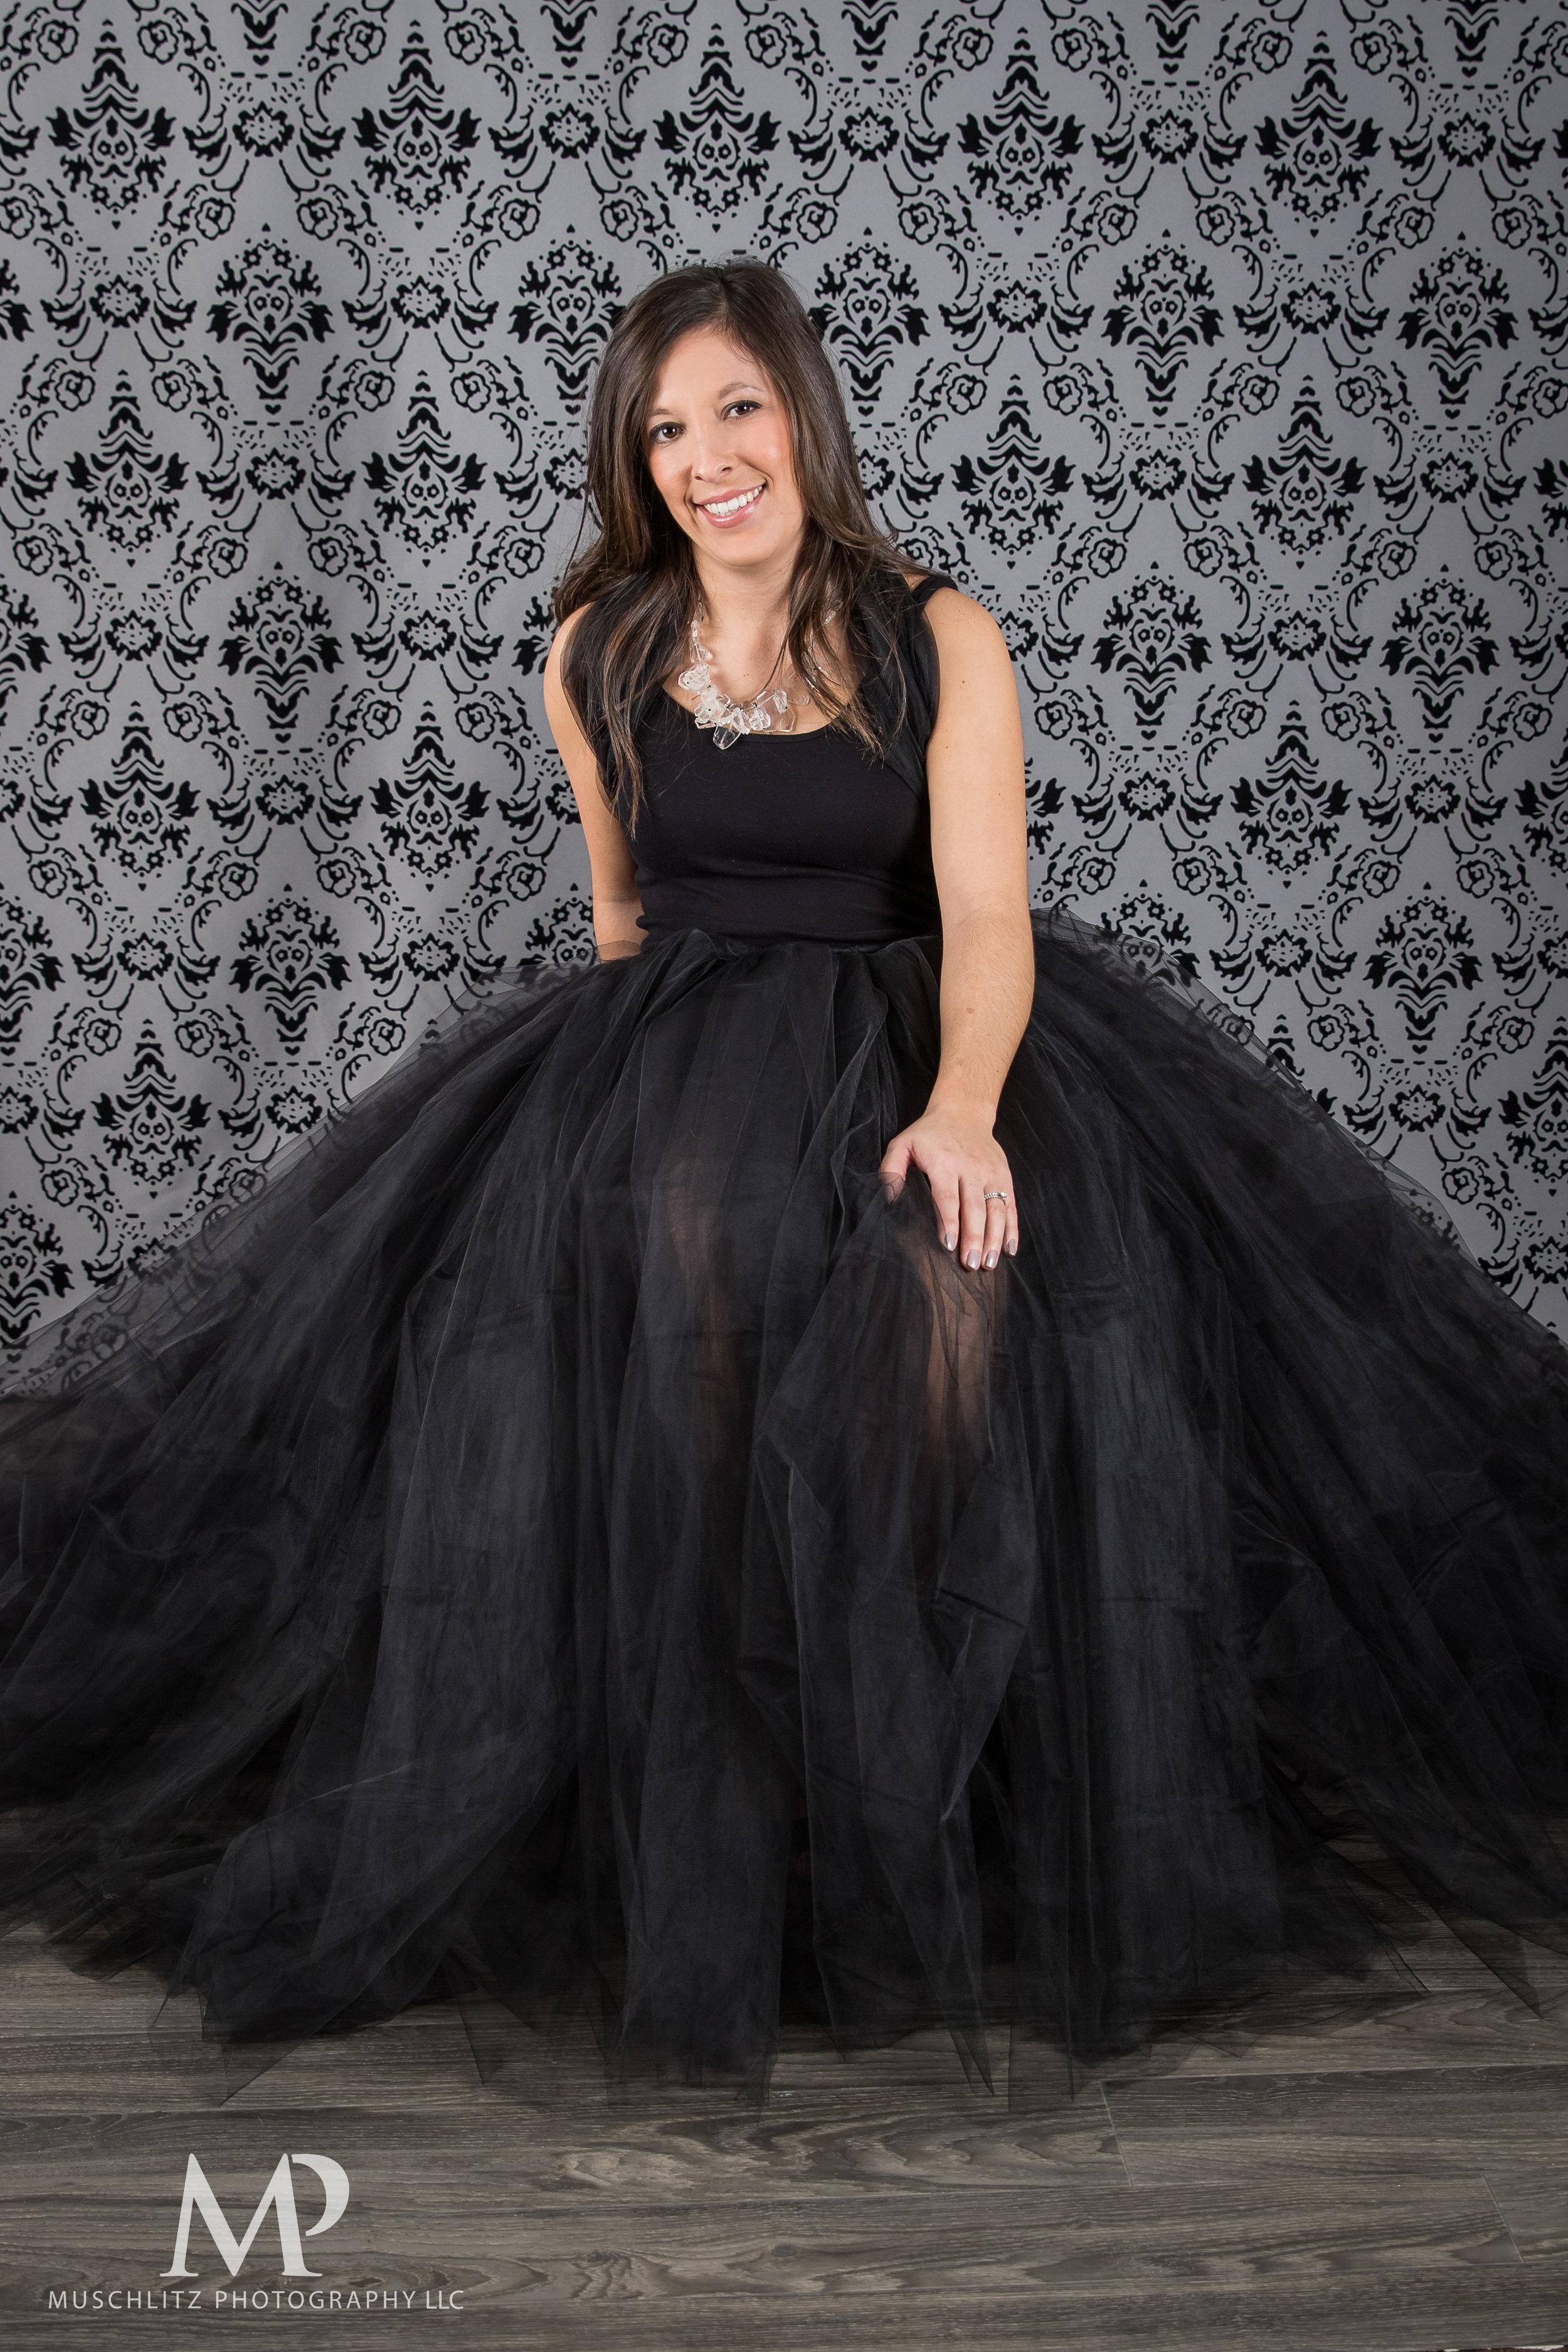 beauty-bridal-glam-the-dress-portraits-photographer-studio-columbus-ohio-gahanna-muschlitz-photography-009.JPG